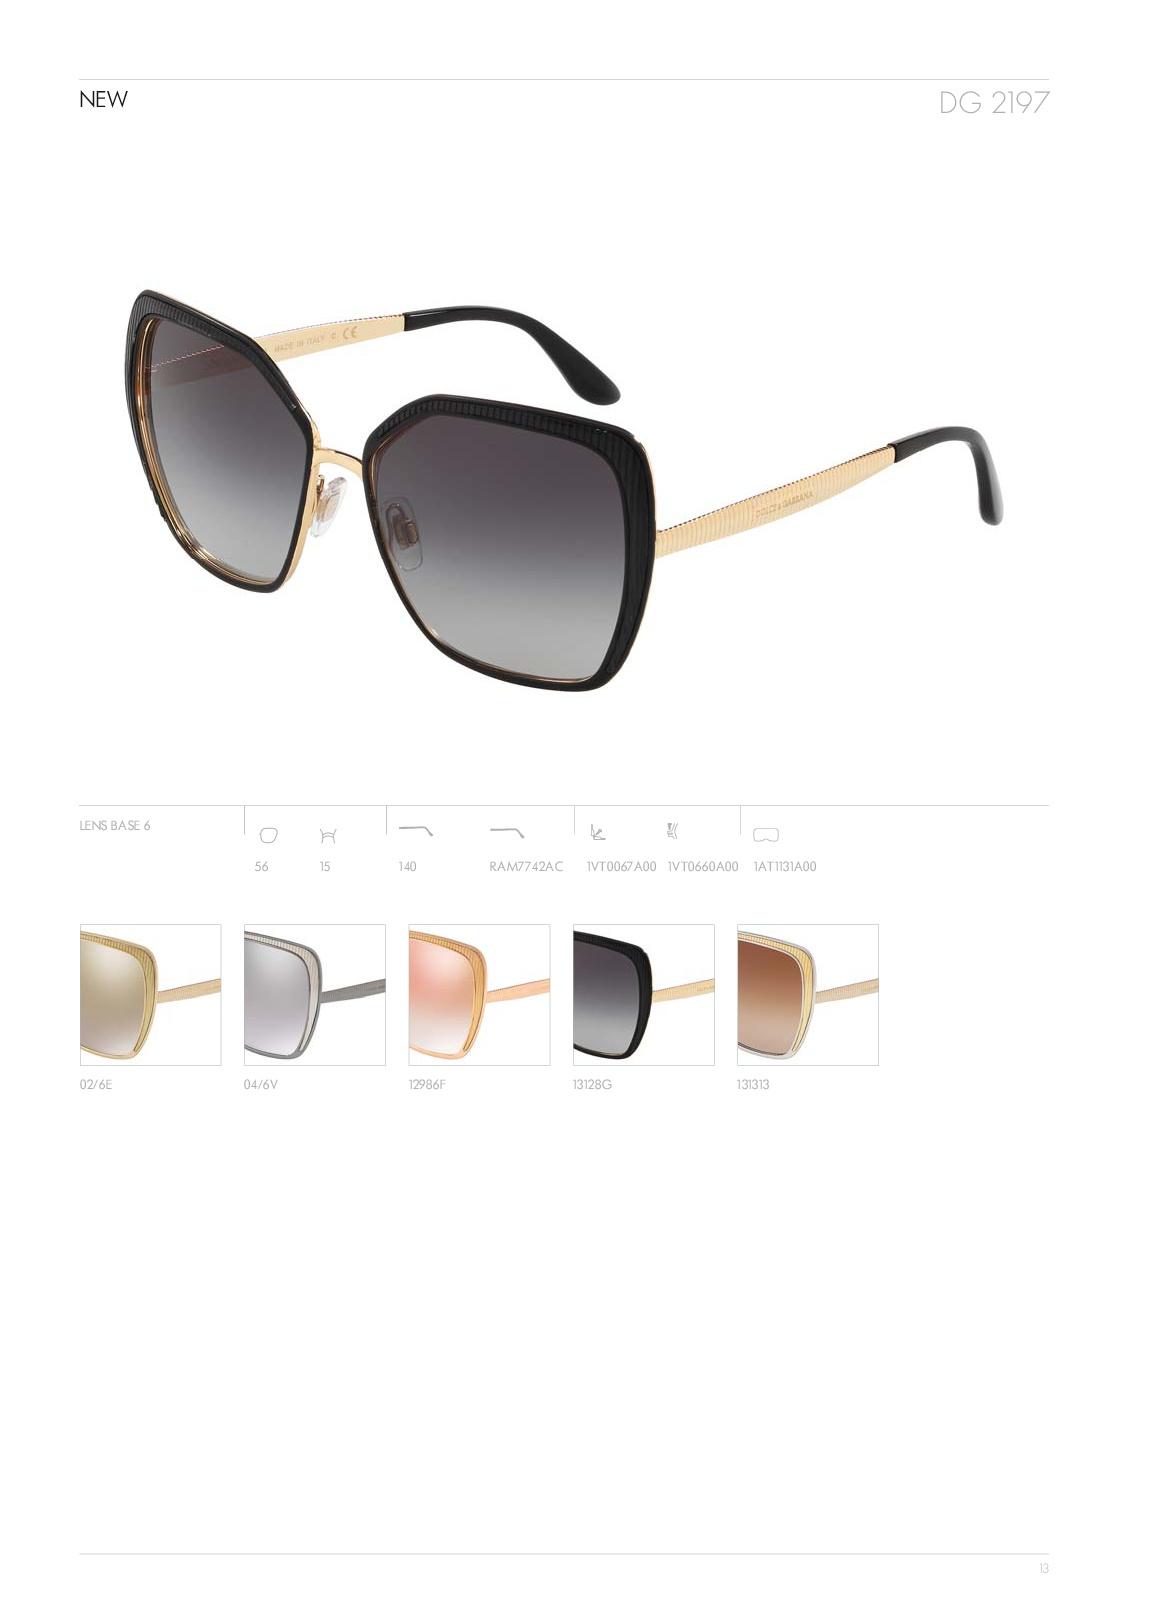 e79c02abc9ed Dolce e Gabbana DG 2197 – Ottica Gottardello – Occhiali da sole e da ...